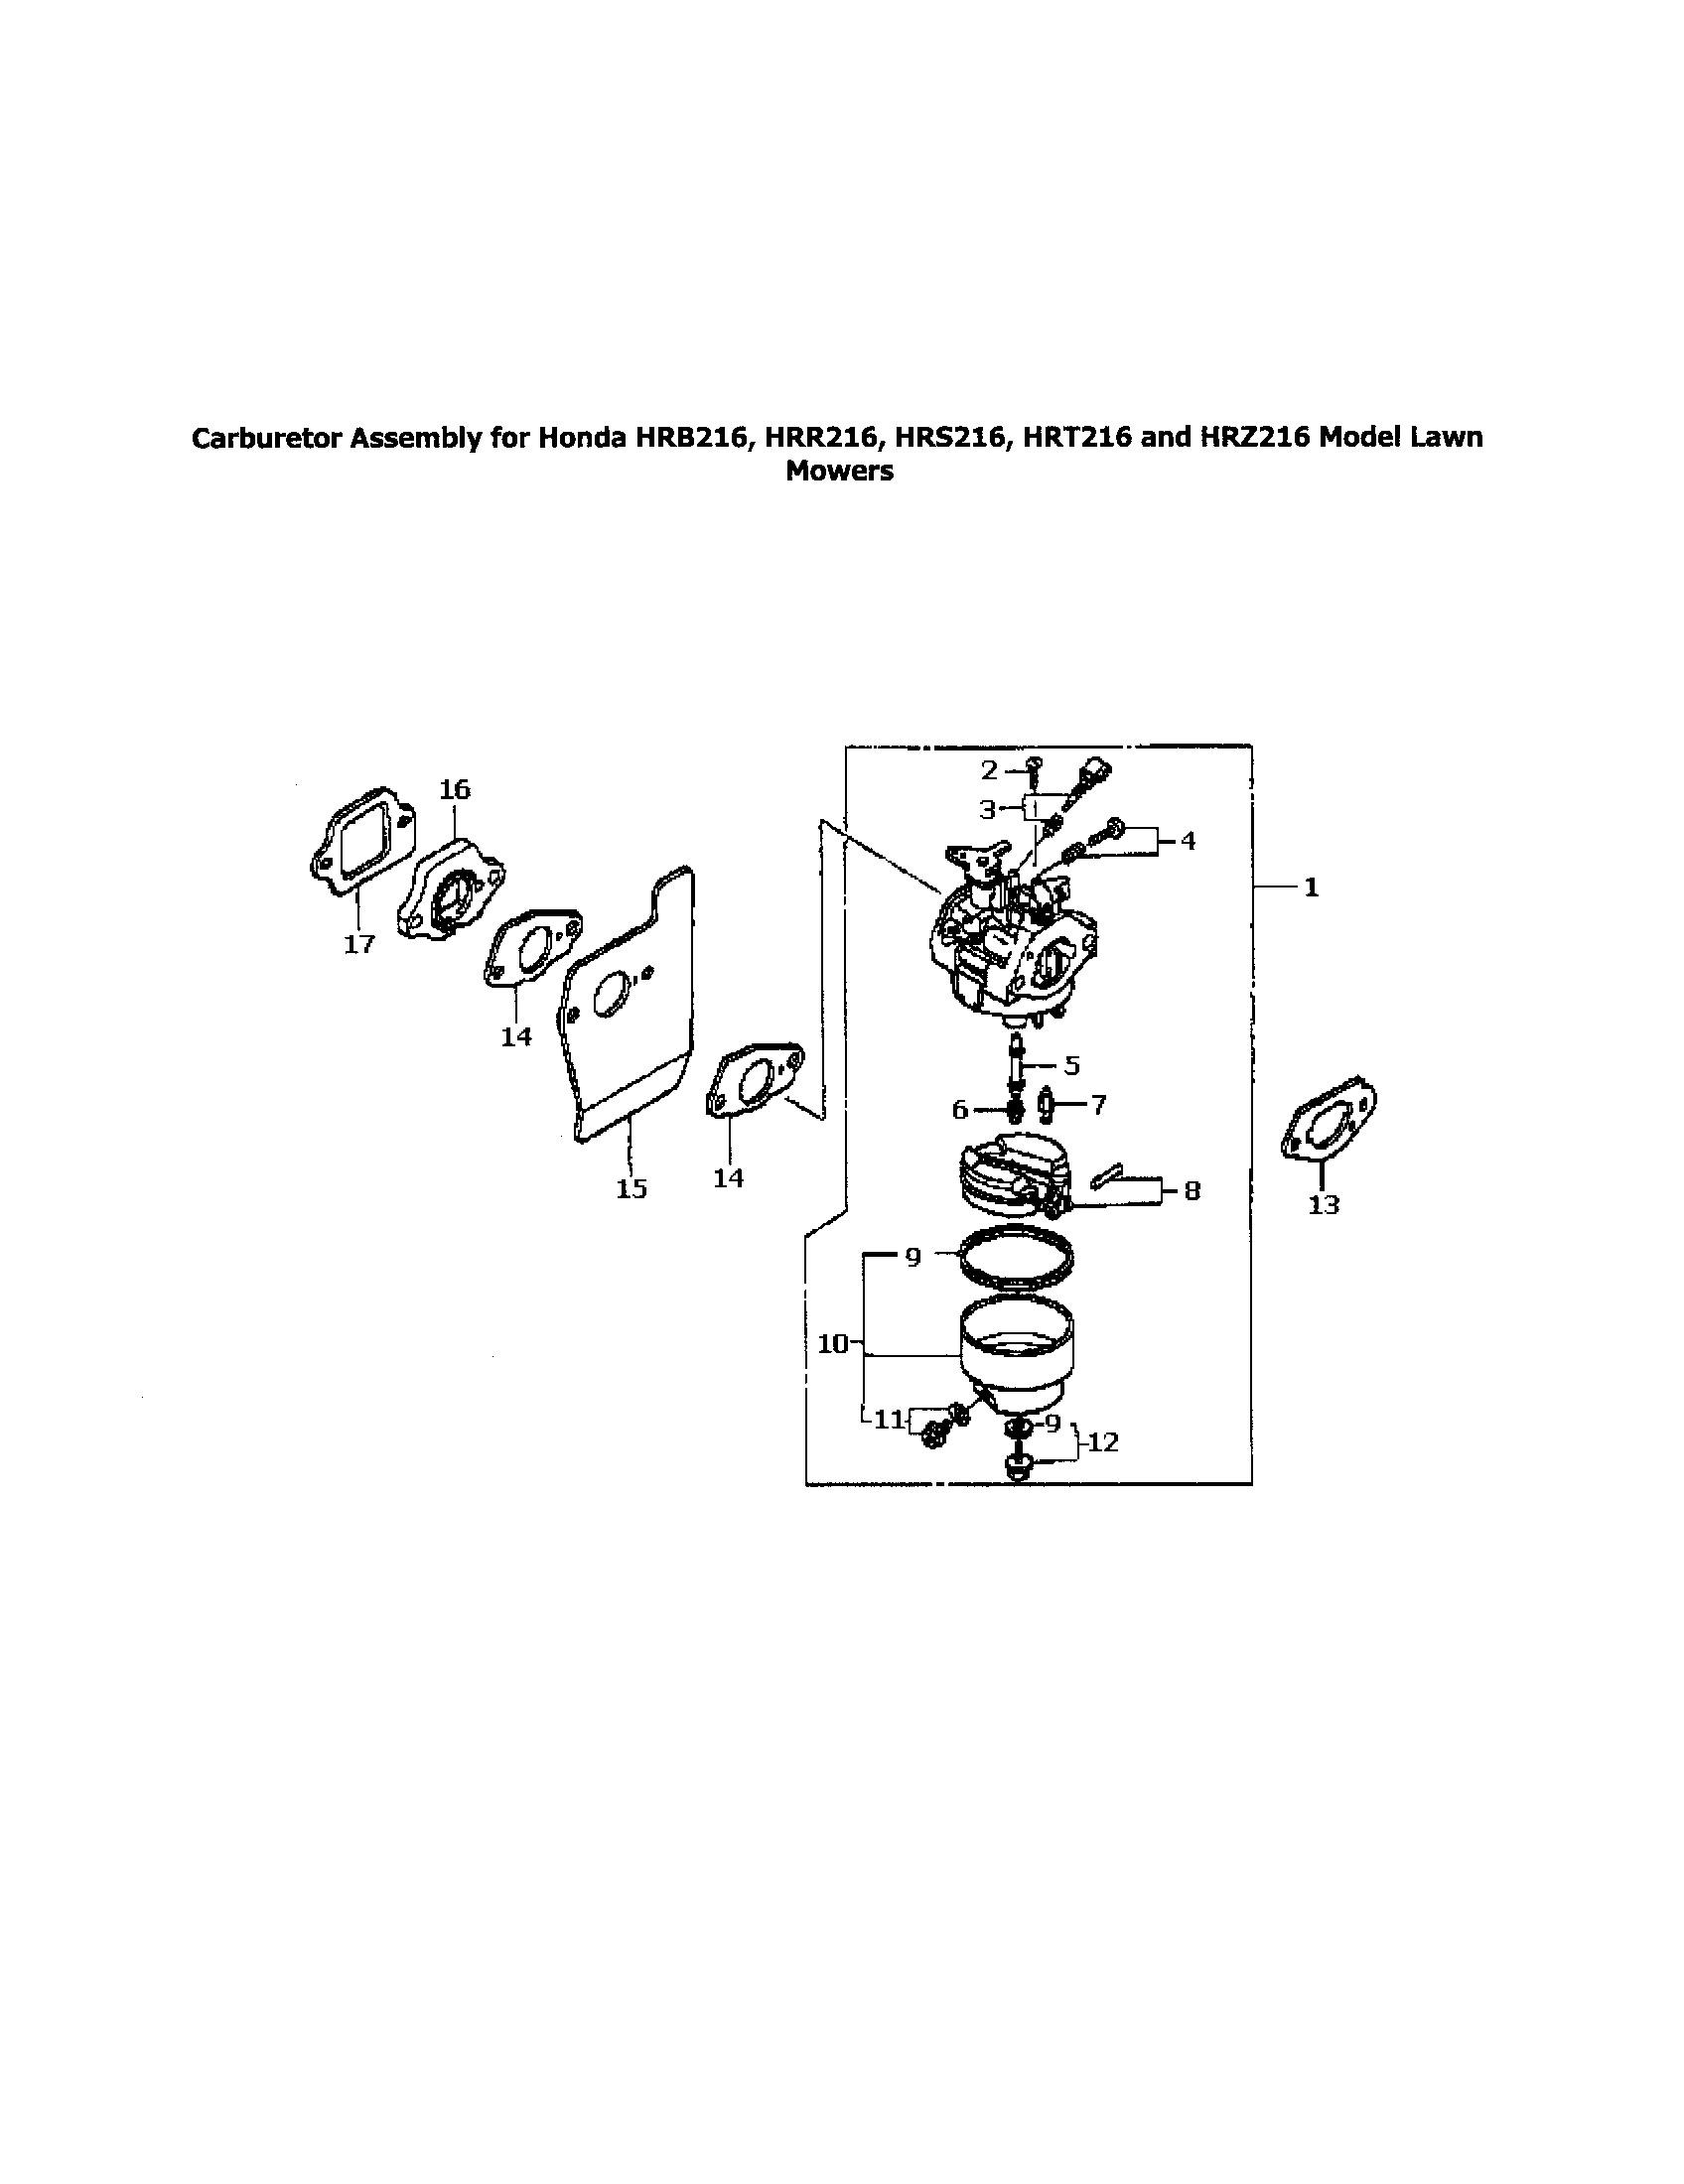 Pleasant Chevy 216 Engine Diagram Auto Electrical Wiring Diagram Wiring Cloud Licukaidewilluminateatxorg